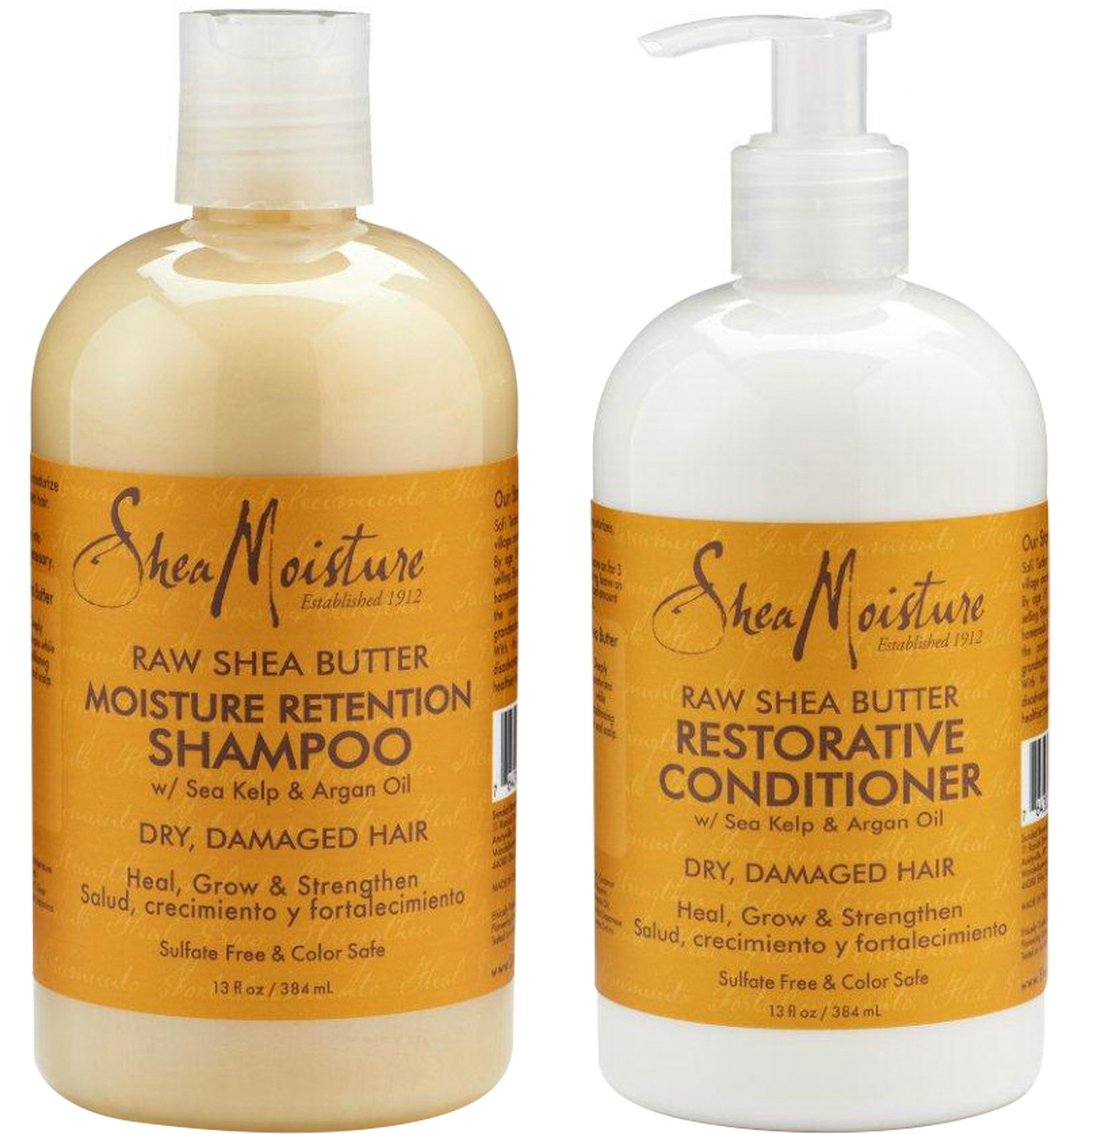 shea moisture shampoo and conditioner